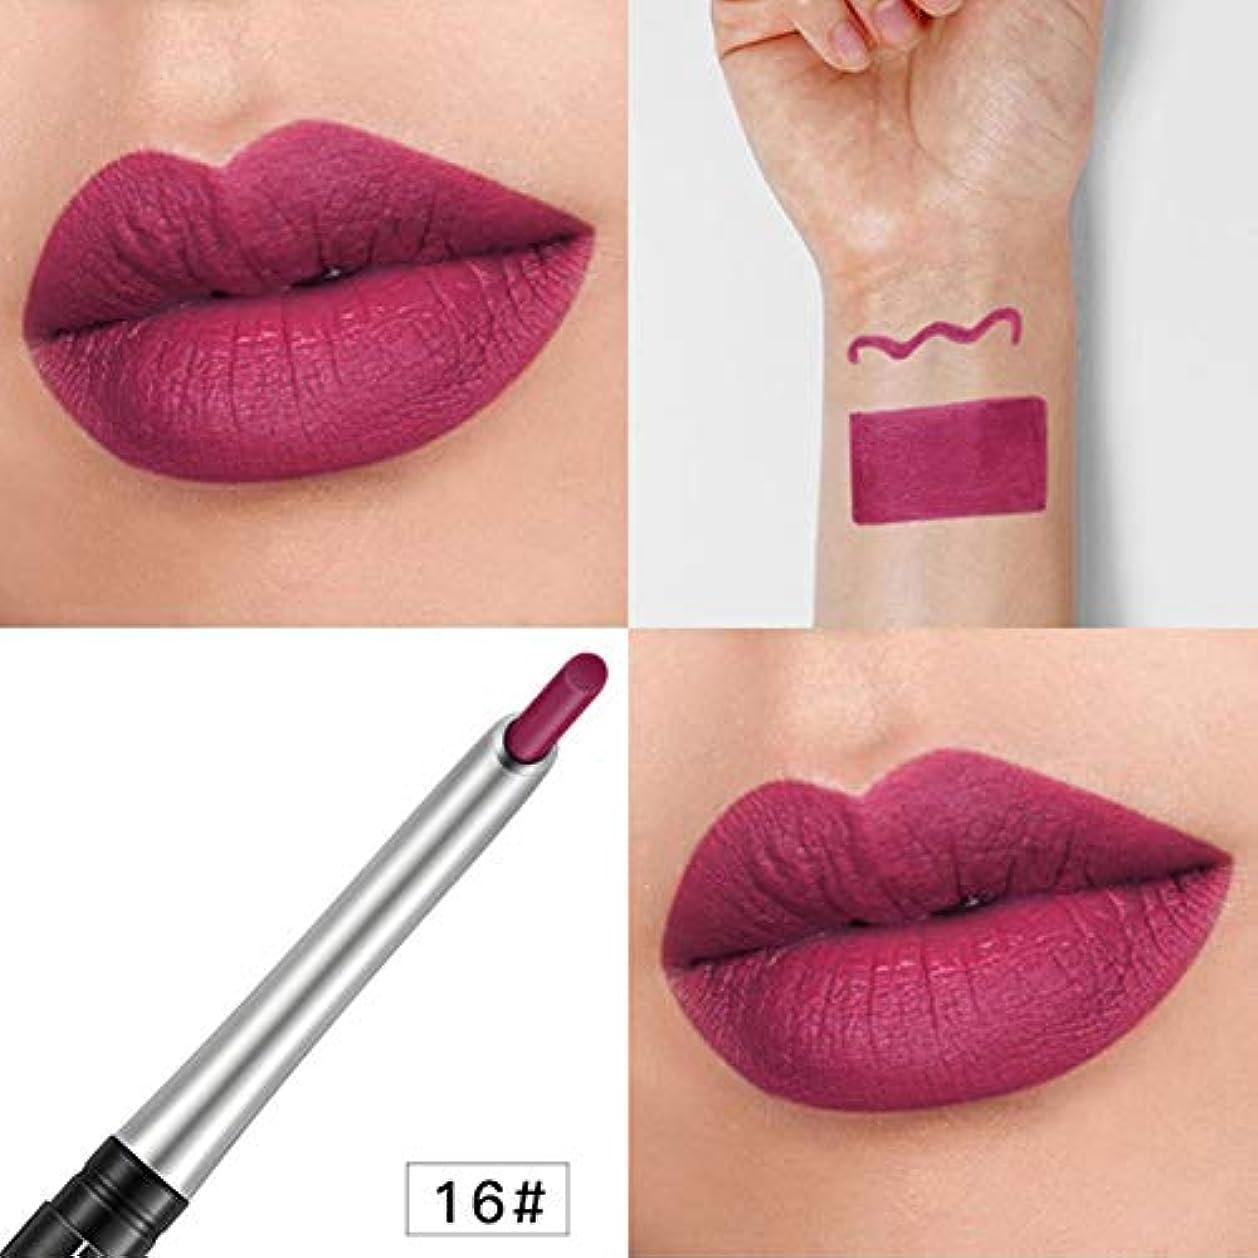 Rabugogo 女性のマットリップライナー防水口紅鉛筆長持ちLlipliner唇メイク 16#